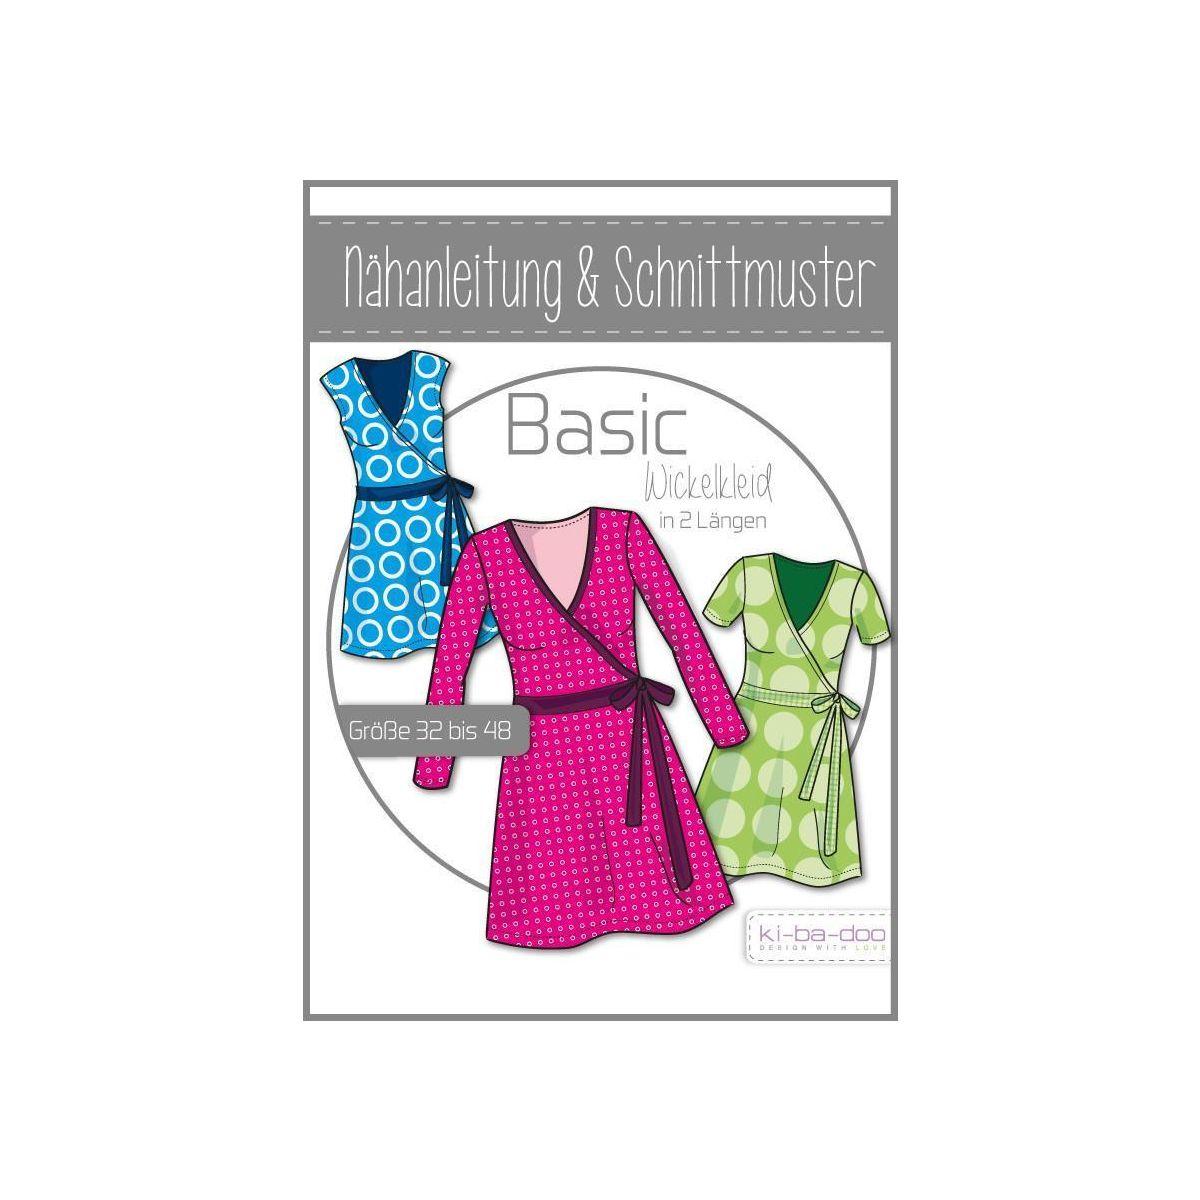 ki-ba-doo Damen Basic Wickelkleid - DIN A 0 Schnittmuster und Anleit